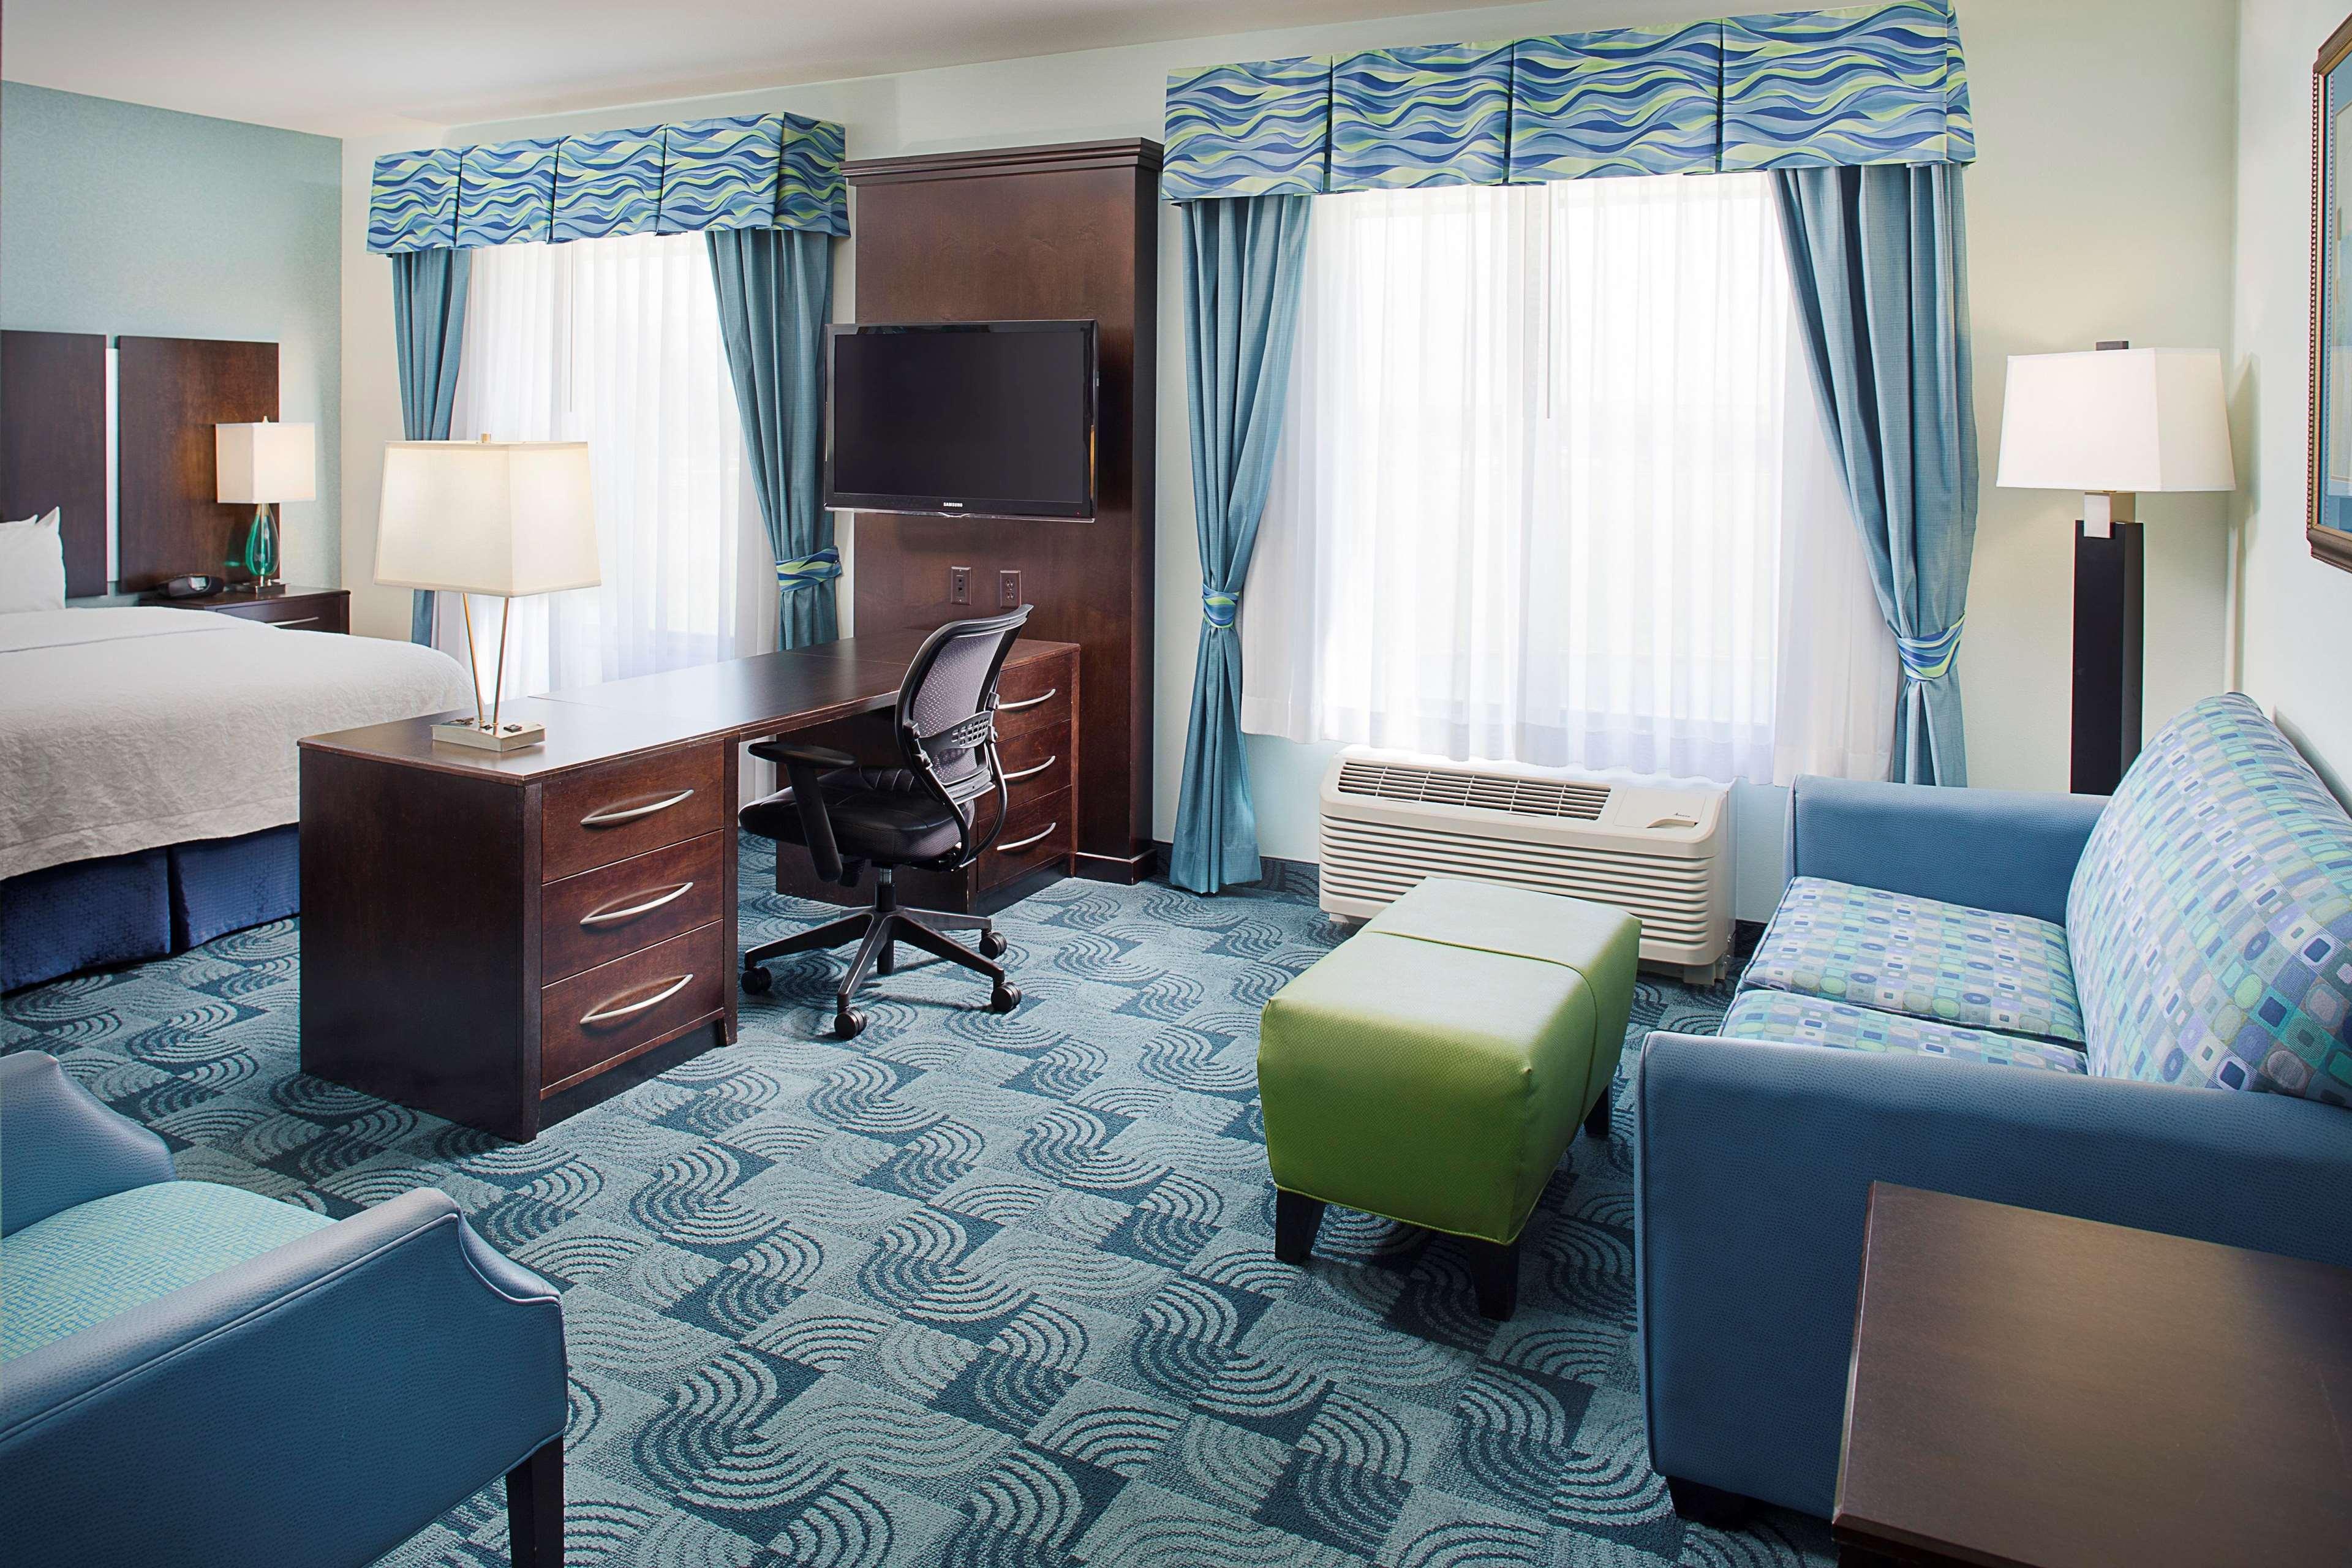 Hampton Inn & Suites Dallas/Lewisville-Vista Ridge Mall, TX image 42